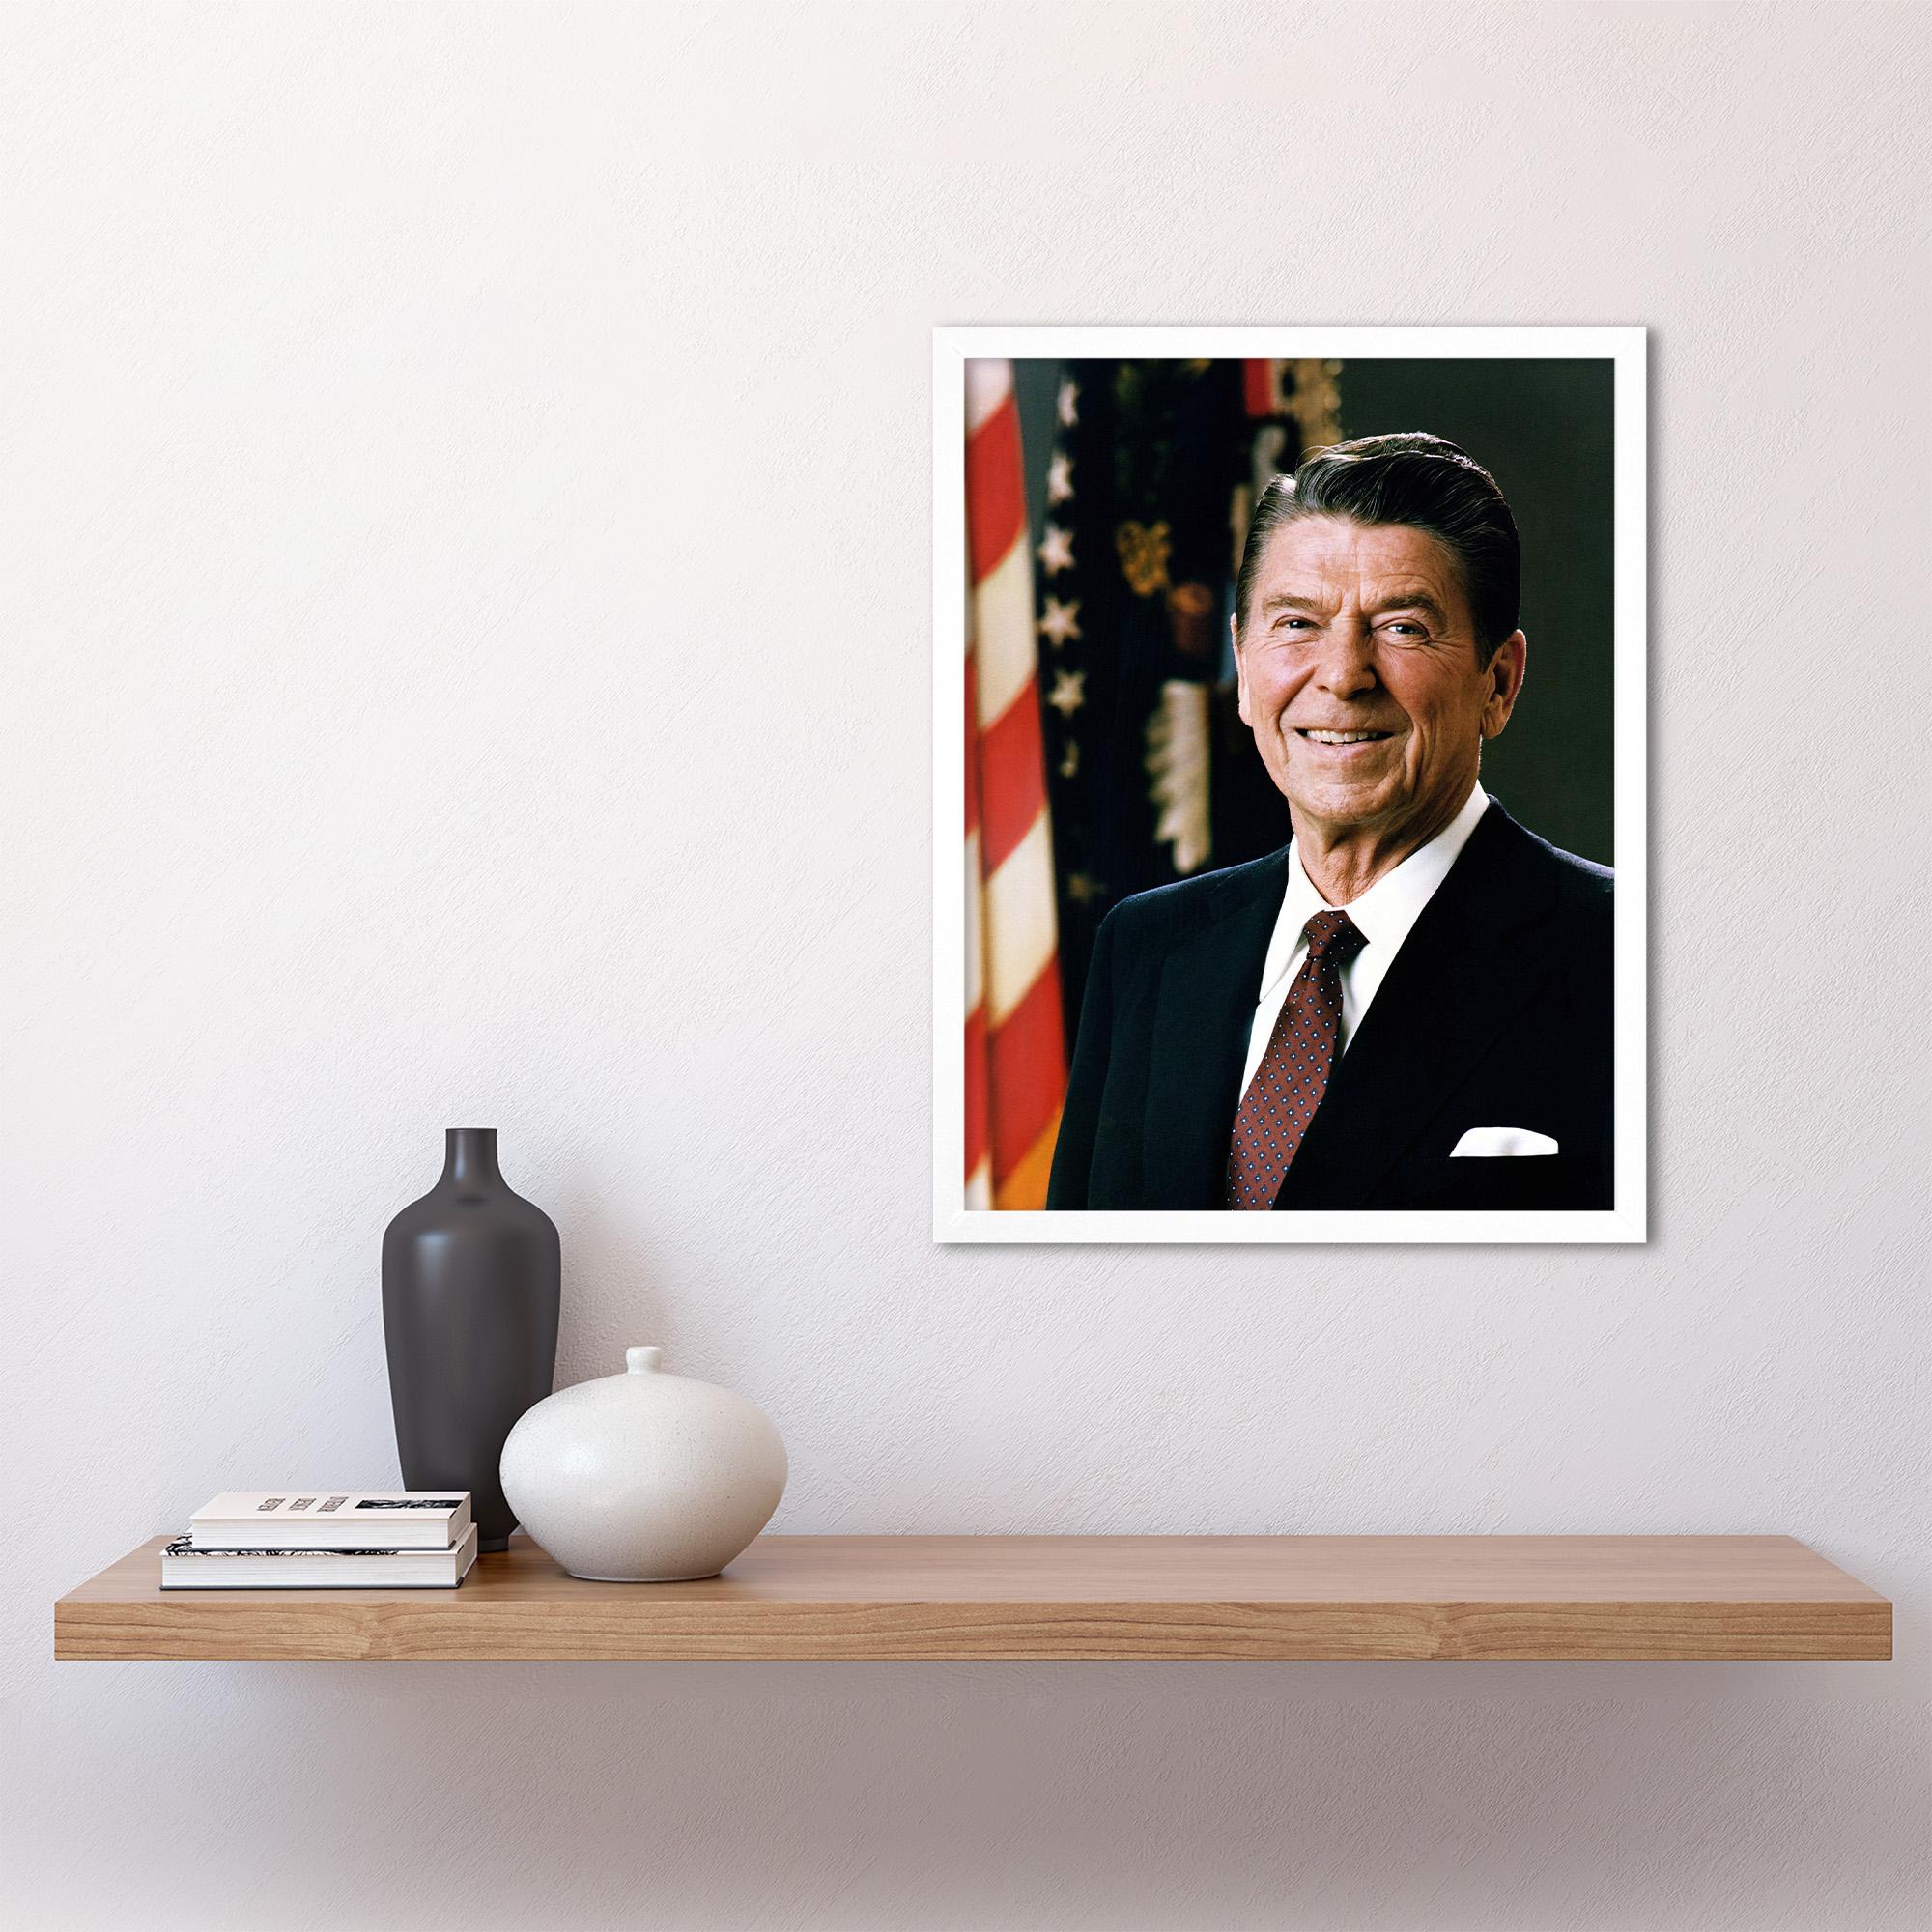 thumbnail 21 - Official-Portrait-US-President-Ronald-Reagan-Photo-Wall-Art-Print-Framed-12x16